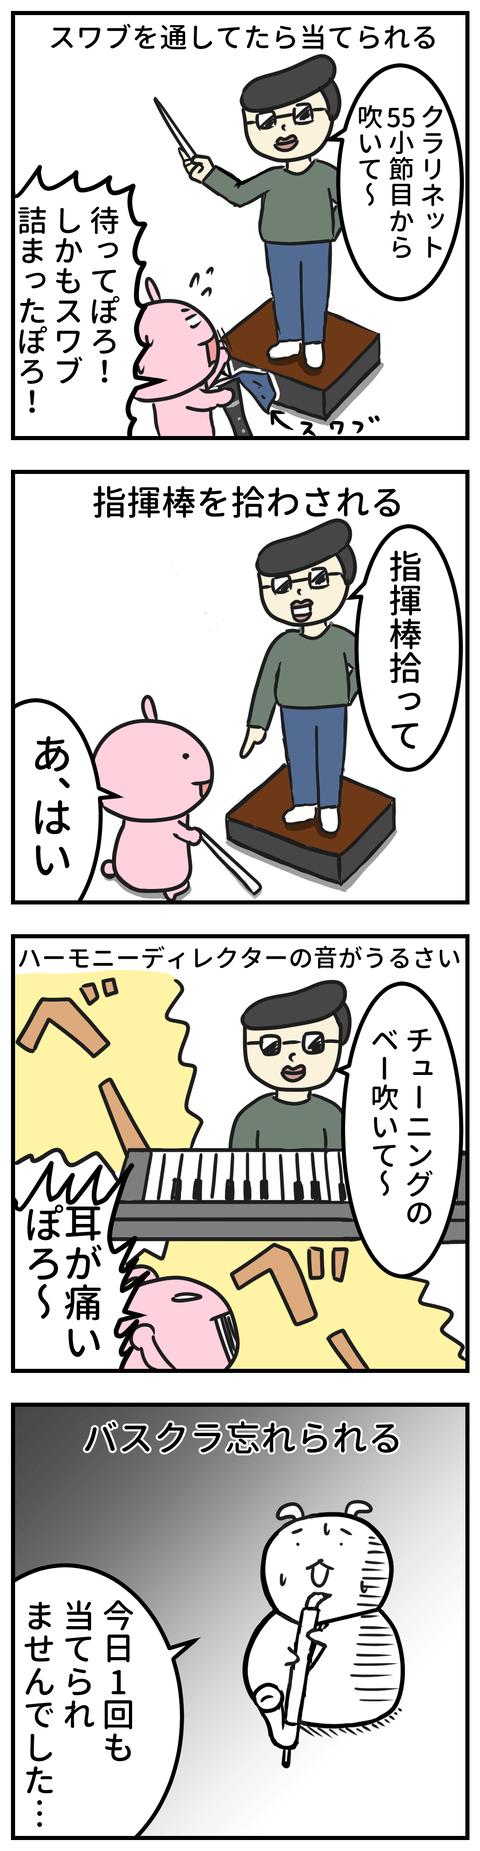 manga-yuzuporo39-1